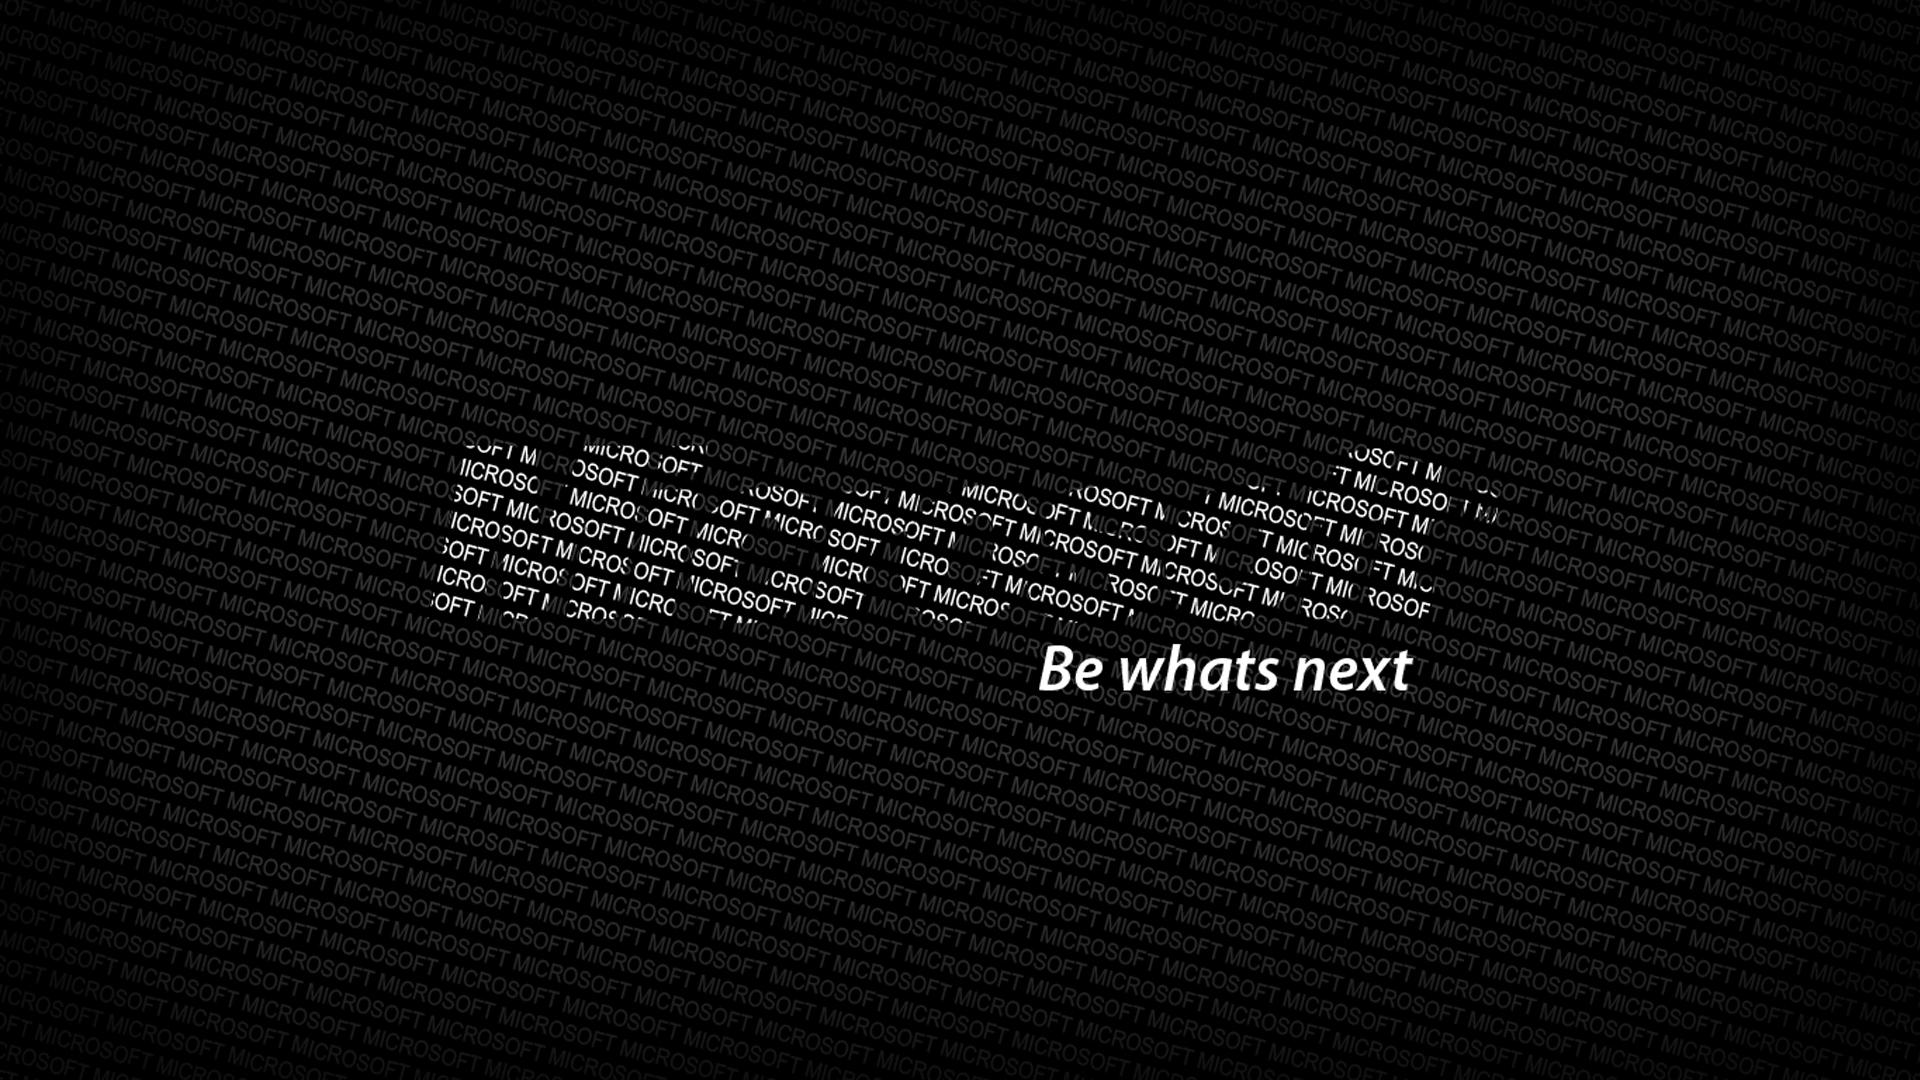 cool microsoft wallpaper 25629